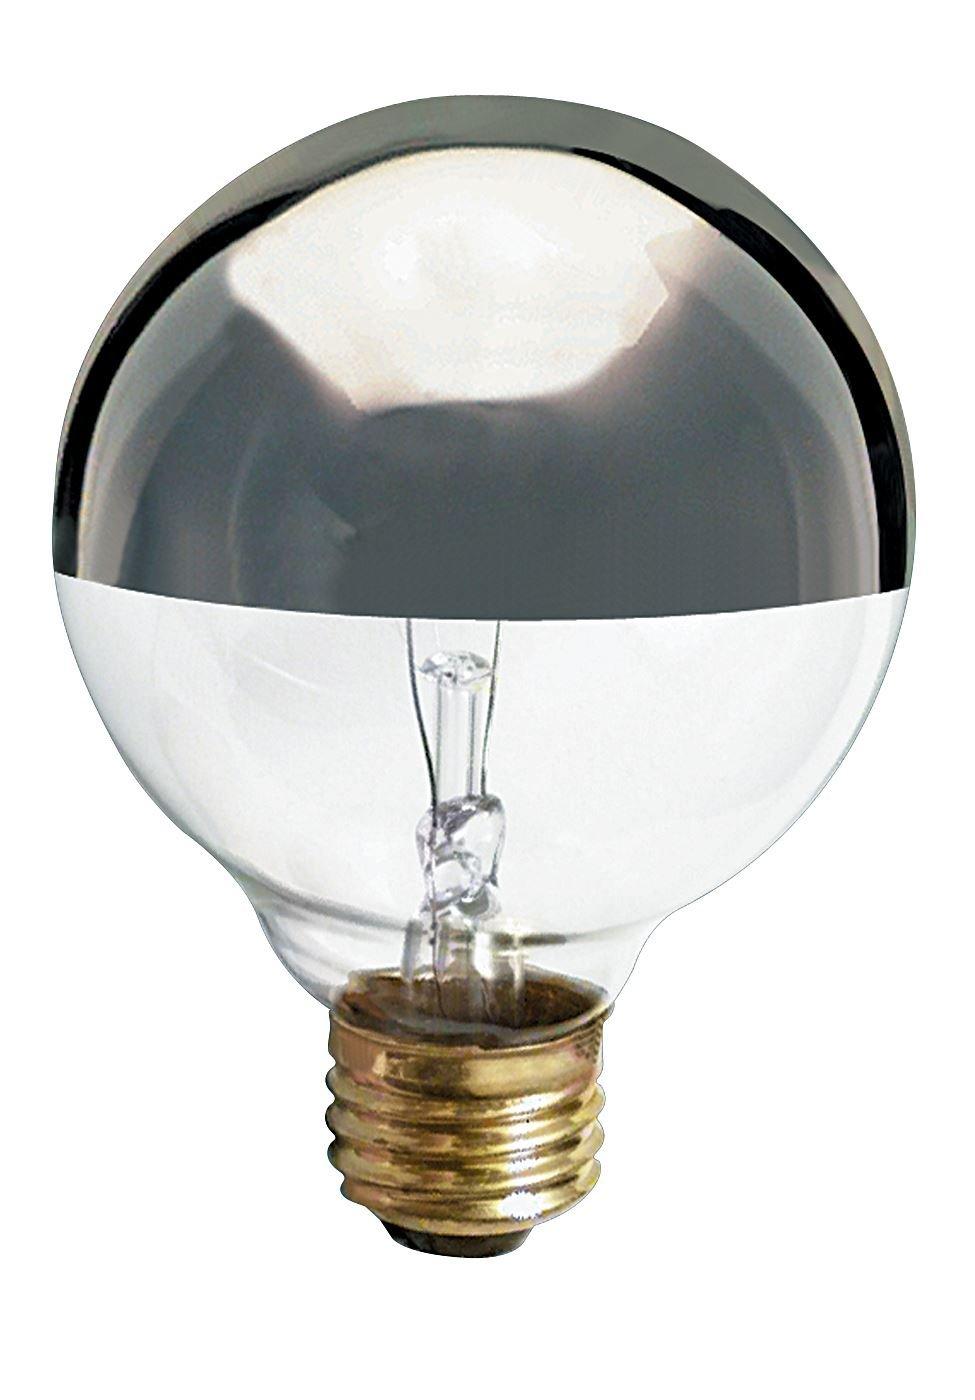 Satco 25G25/SL Incandescent Globe Light, 25W E26 G25, Silver Crown Bulb [Pack of 12]